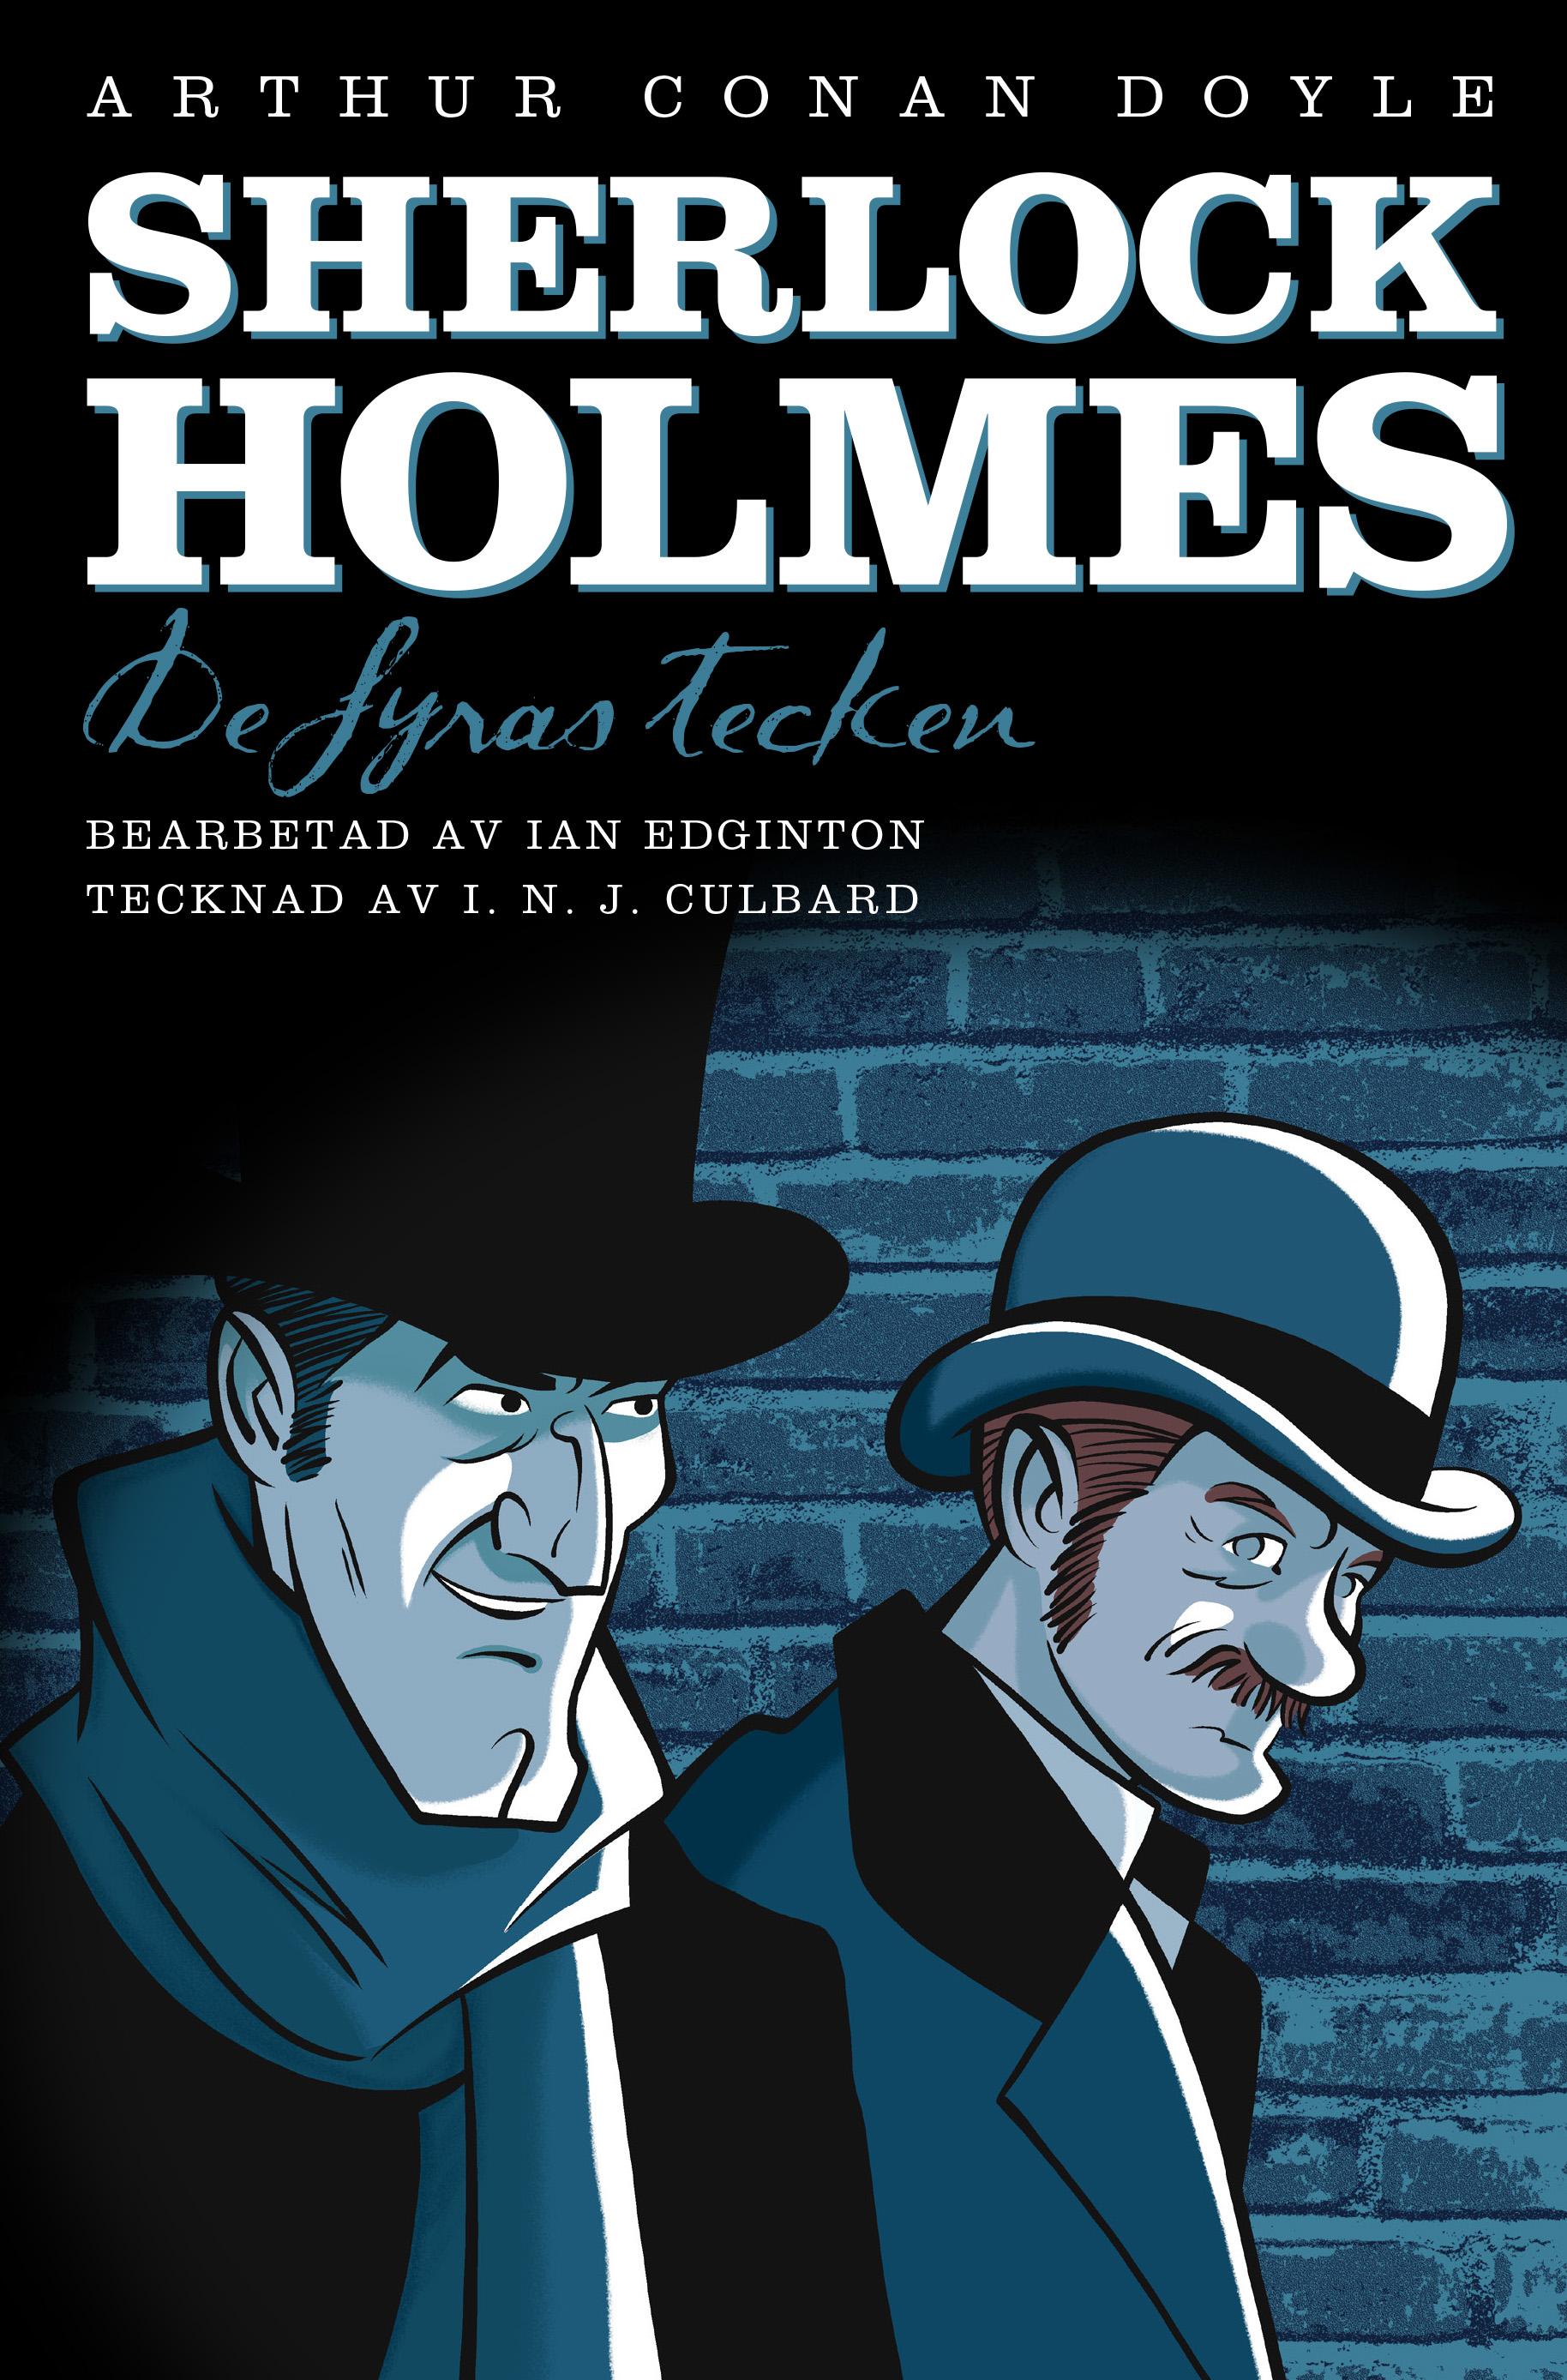 Sherlock Holmes. De fyras tecken av Arthur Conan Doyle